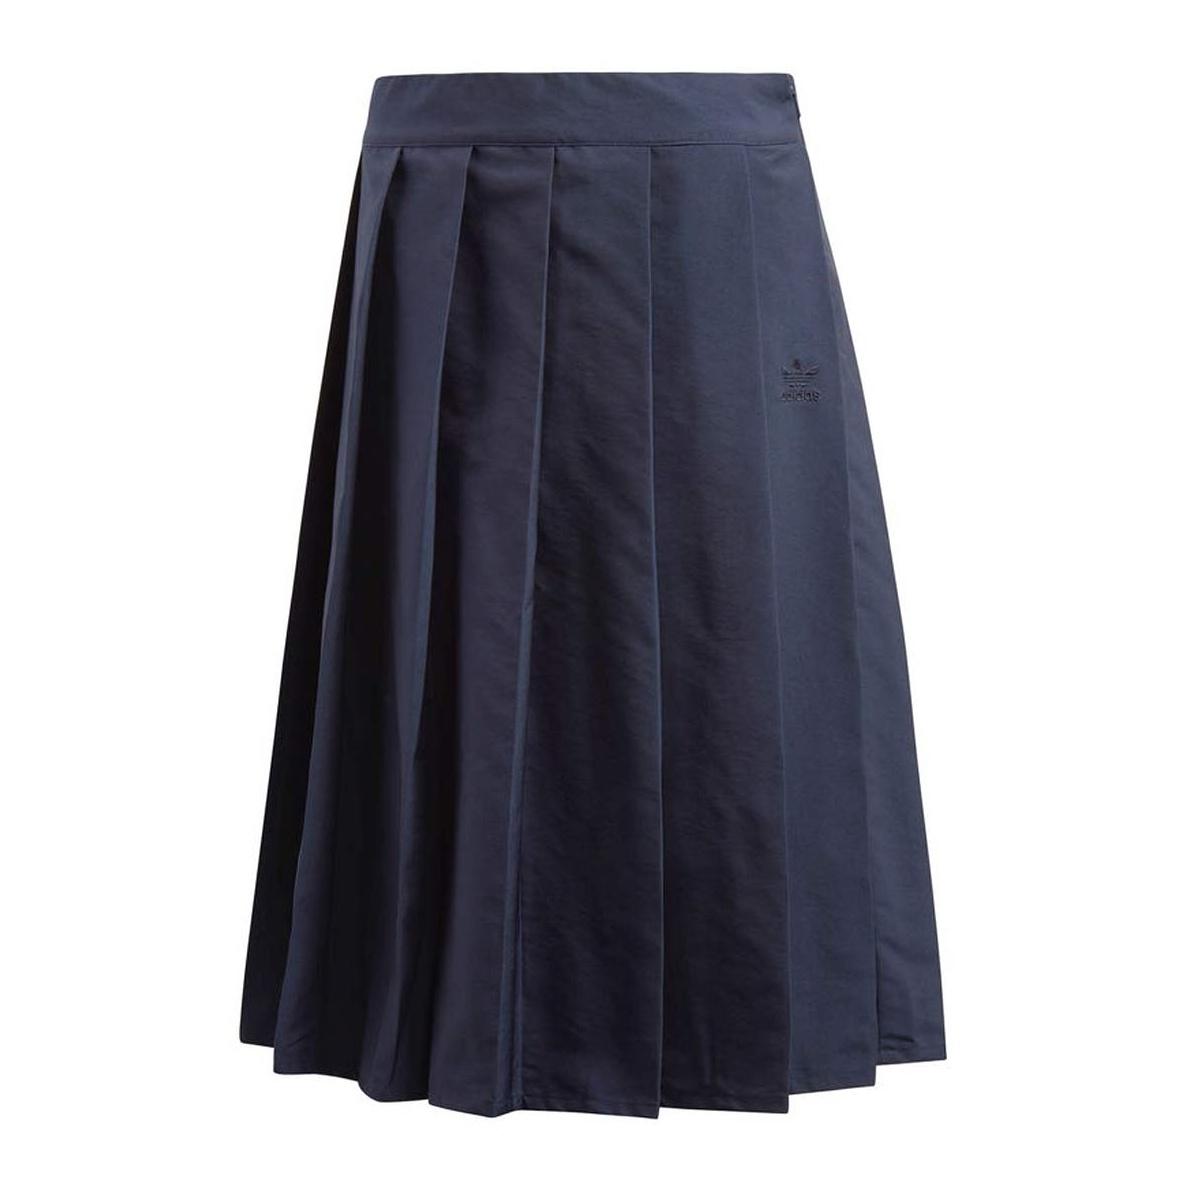 دامن زنانه آدیداس مدل navy skirt ess کد CD6897